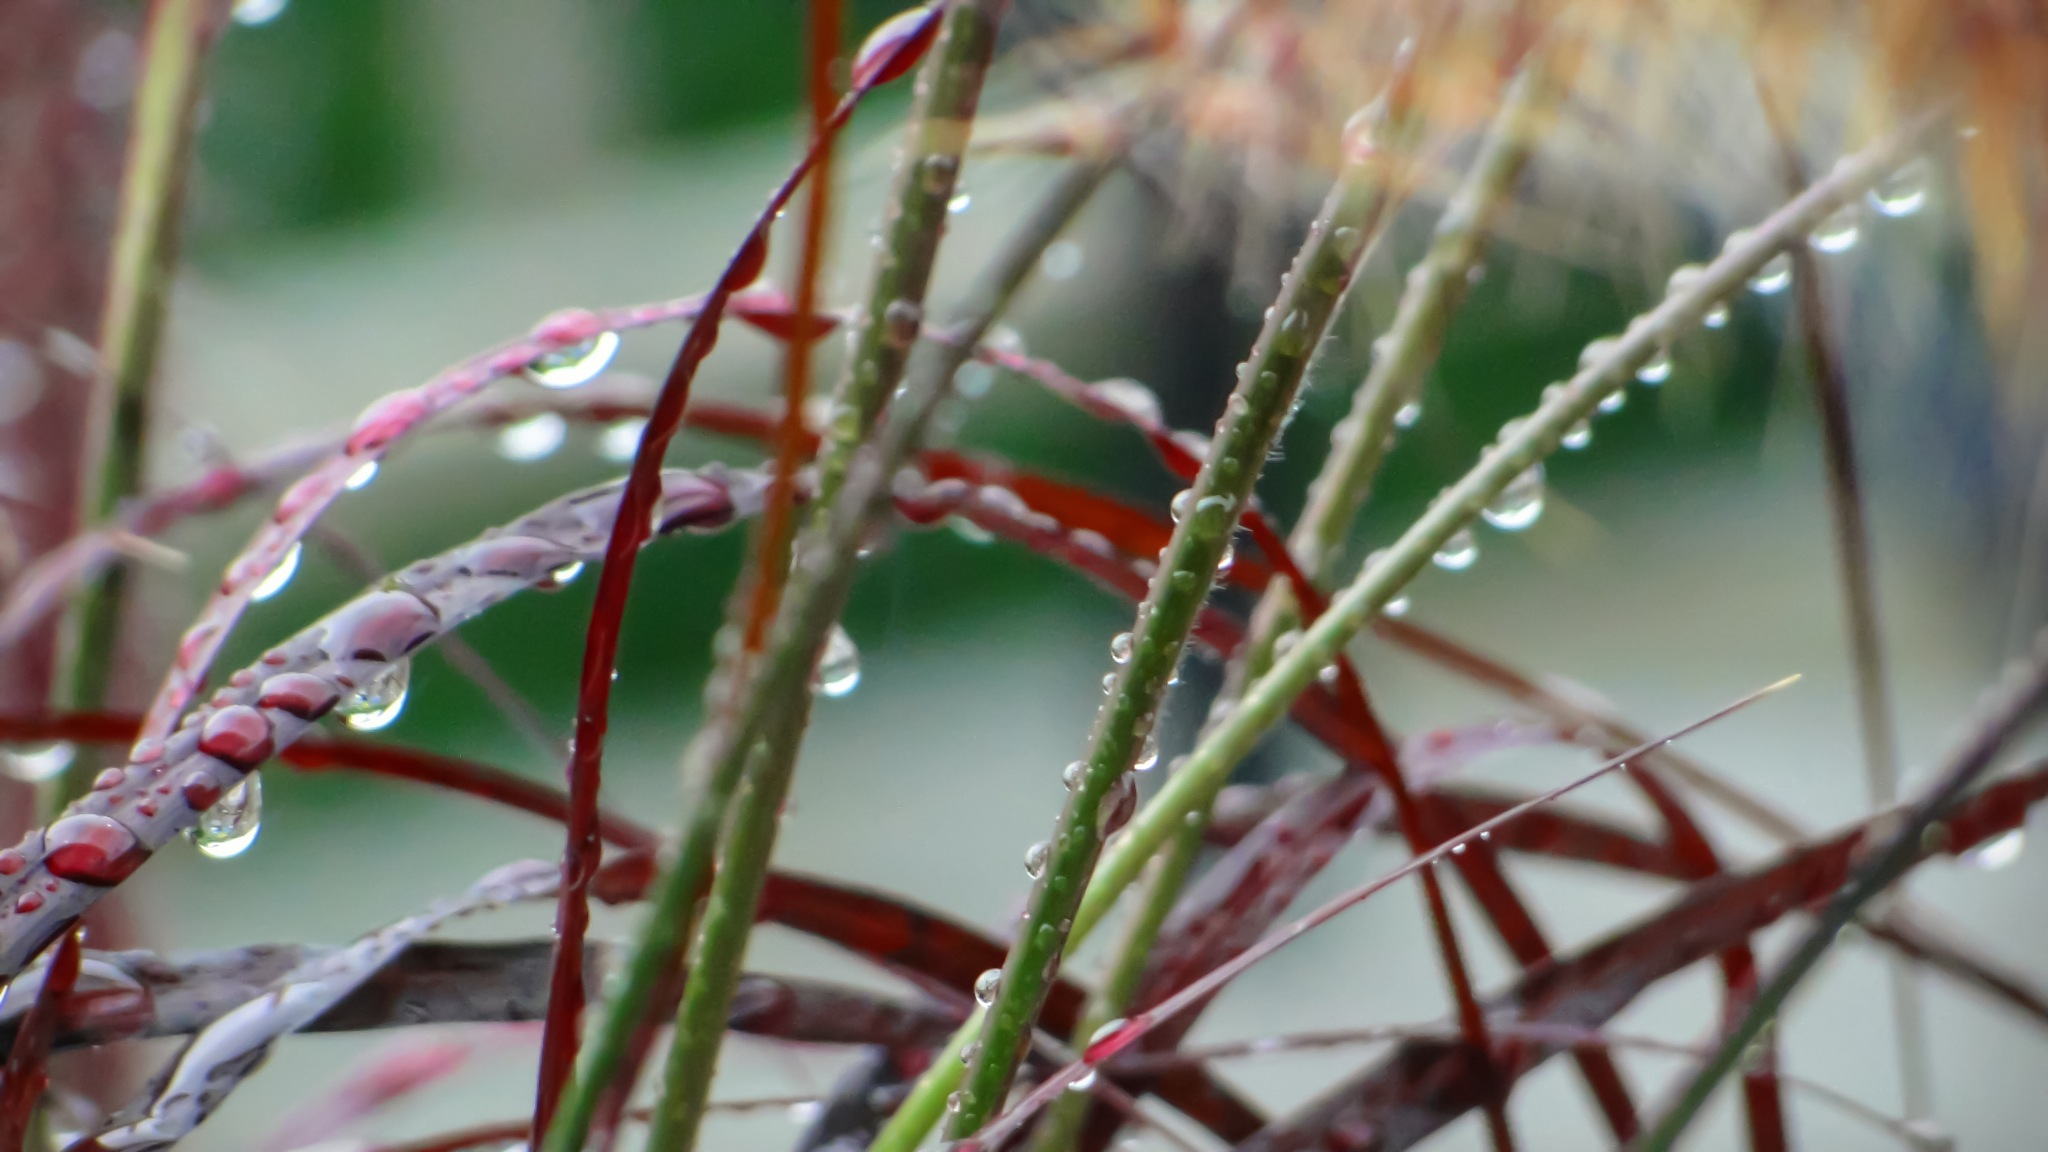 Backyard Flora by Ariane Dufort